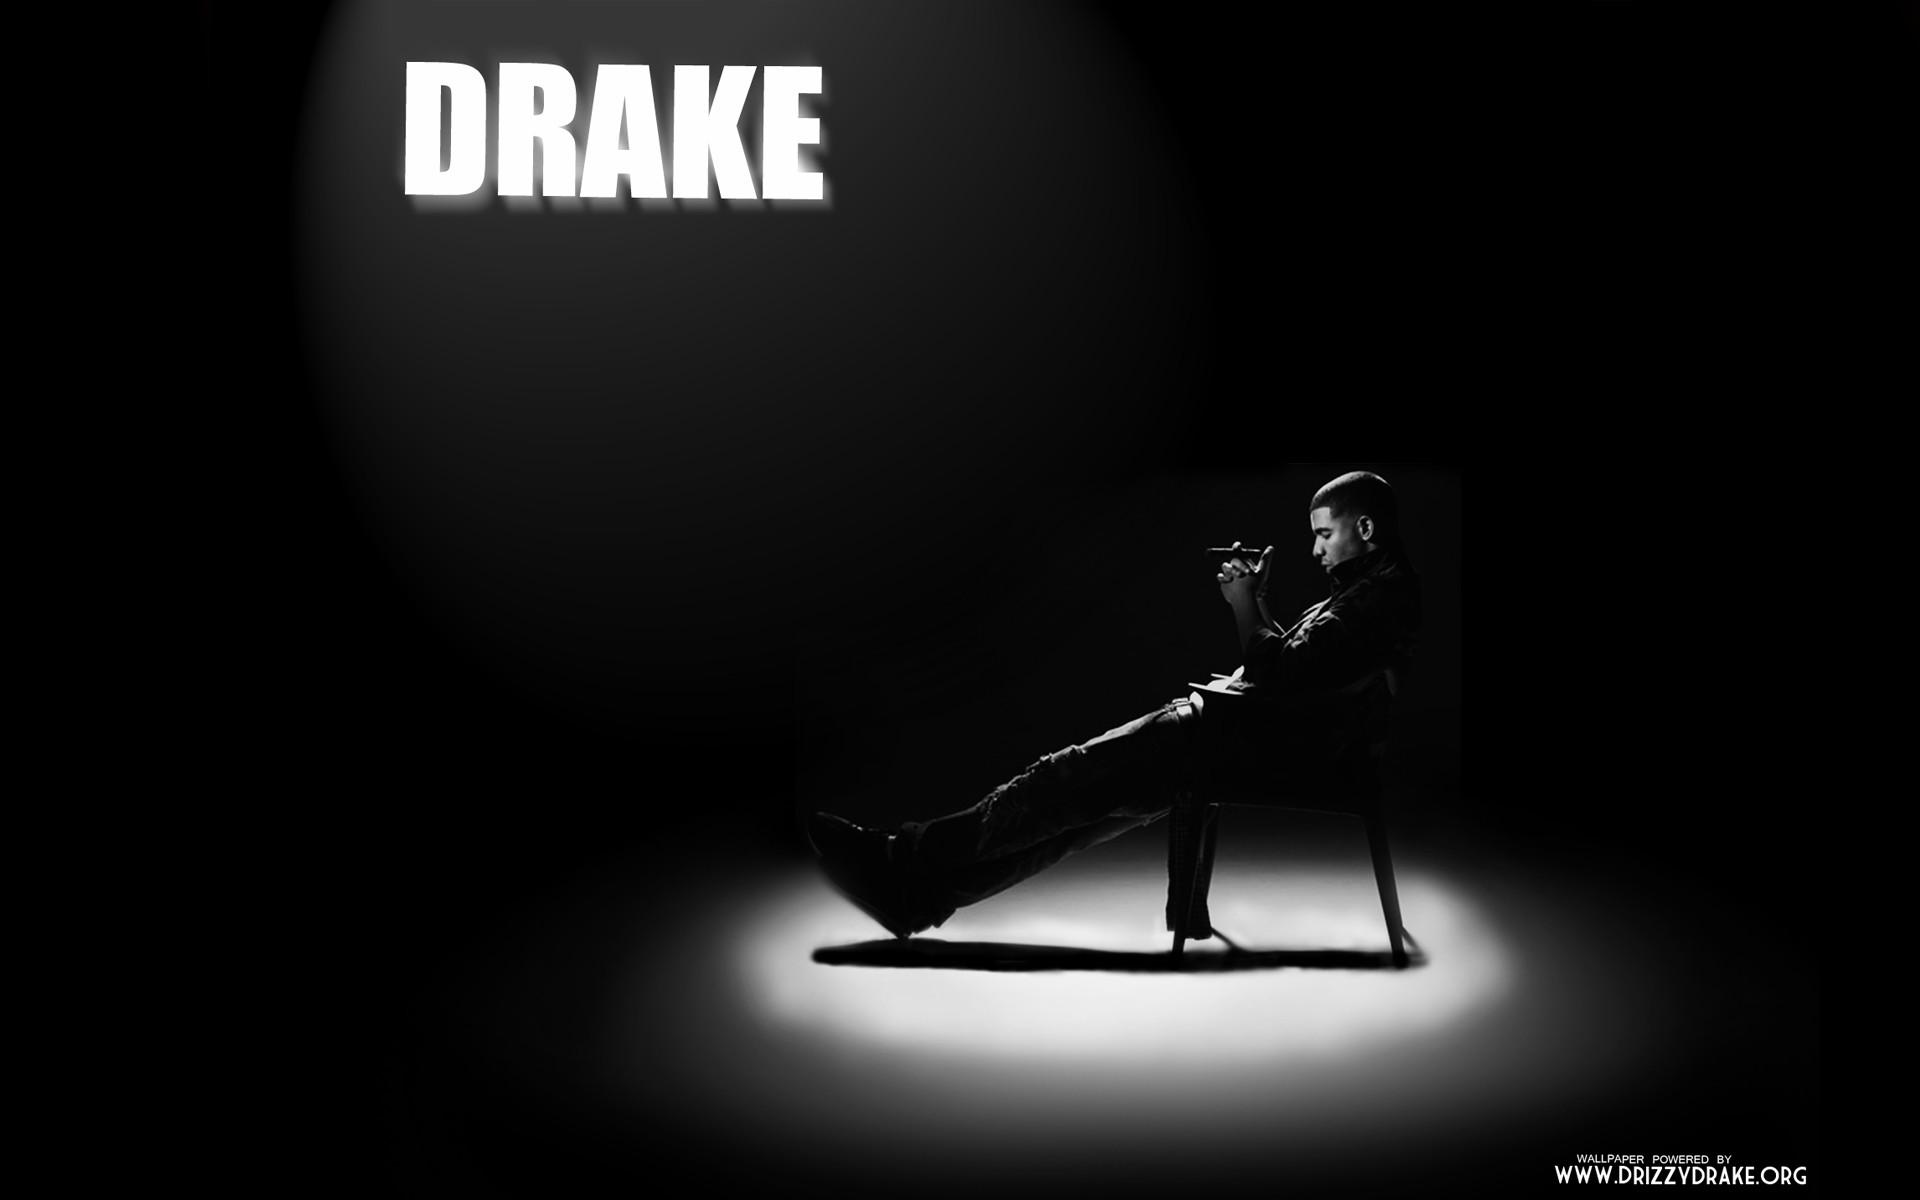 Top Drake Live Wallpaper Hd Wallpapers